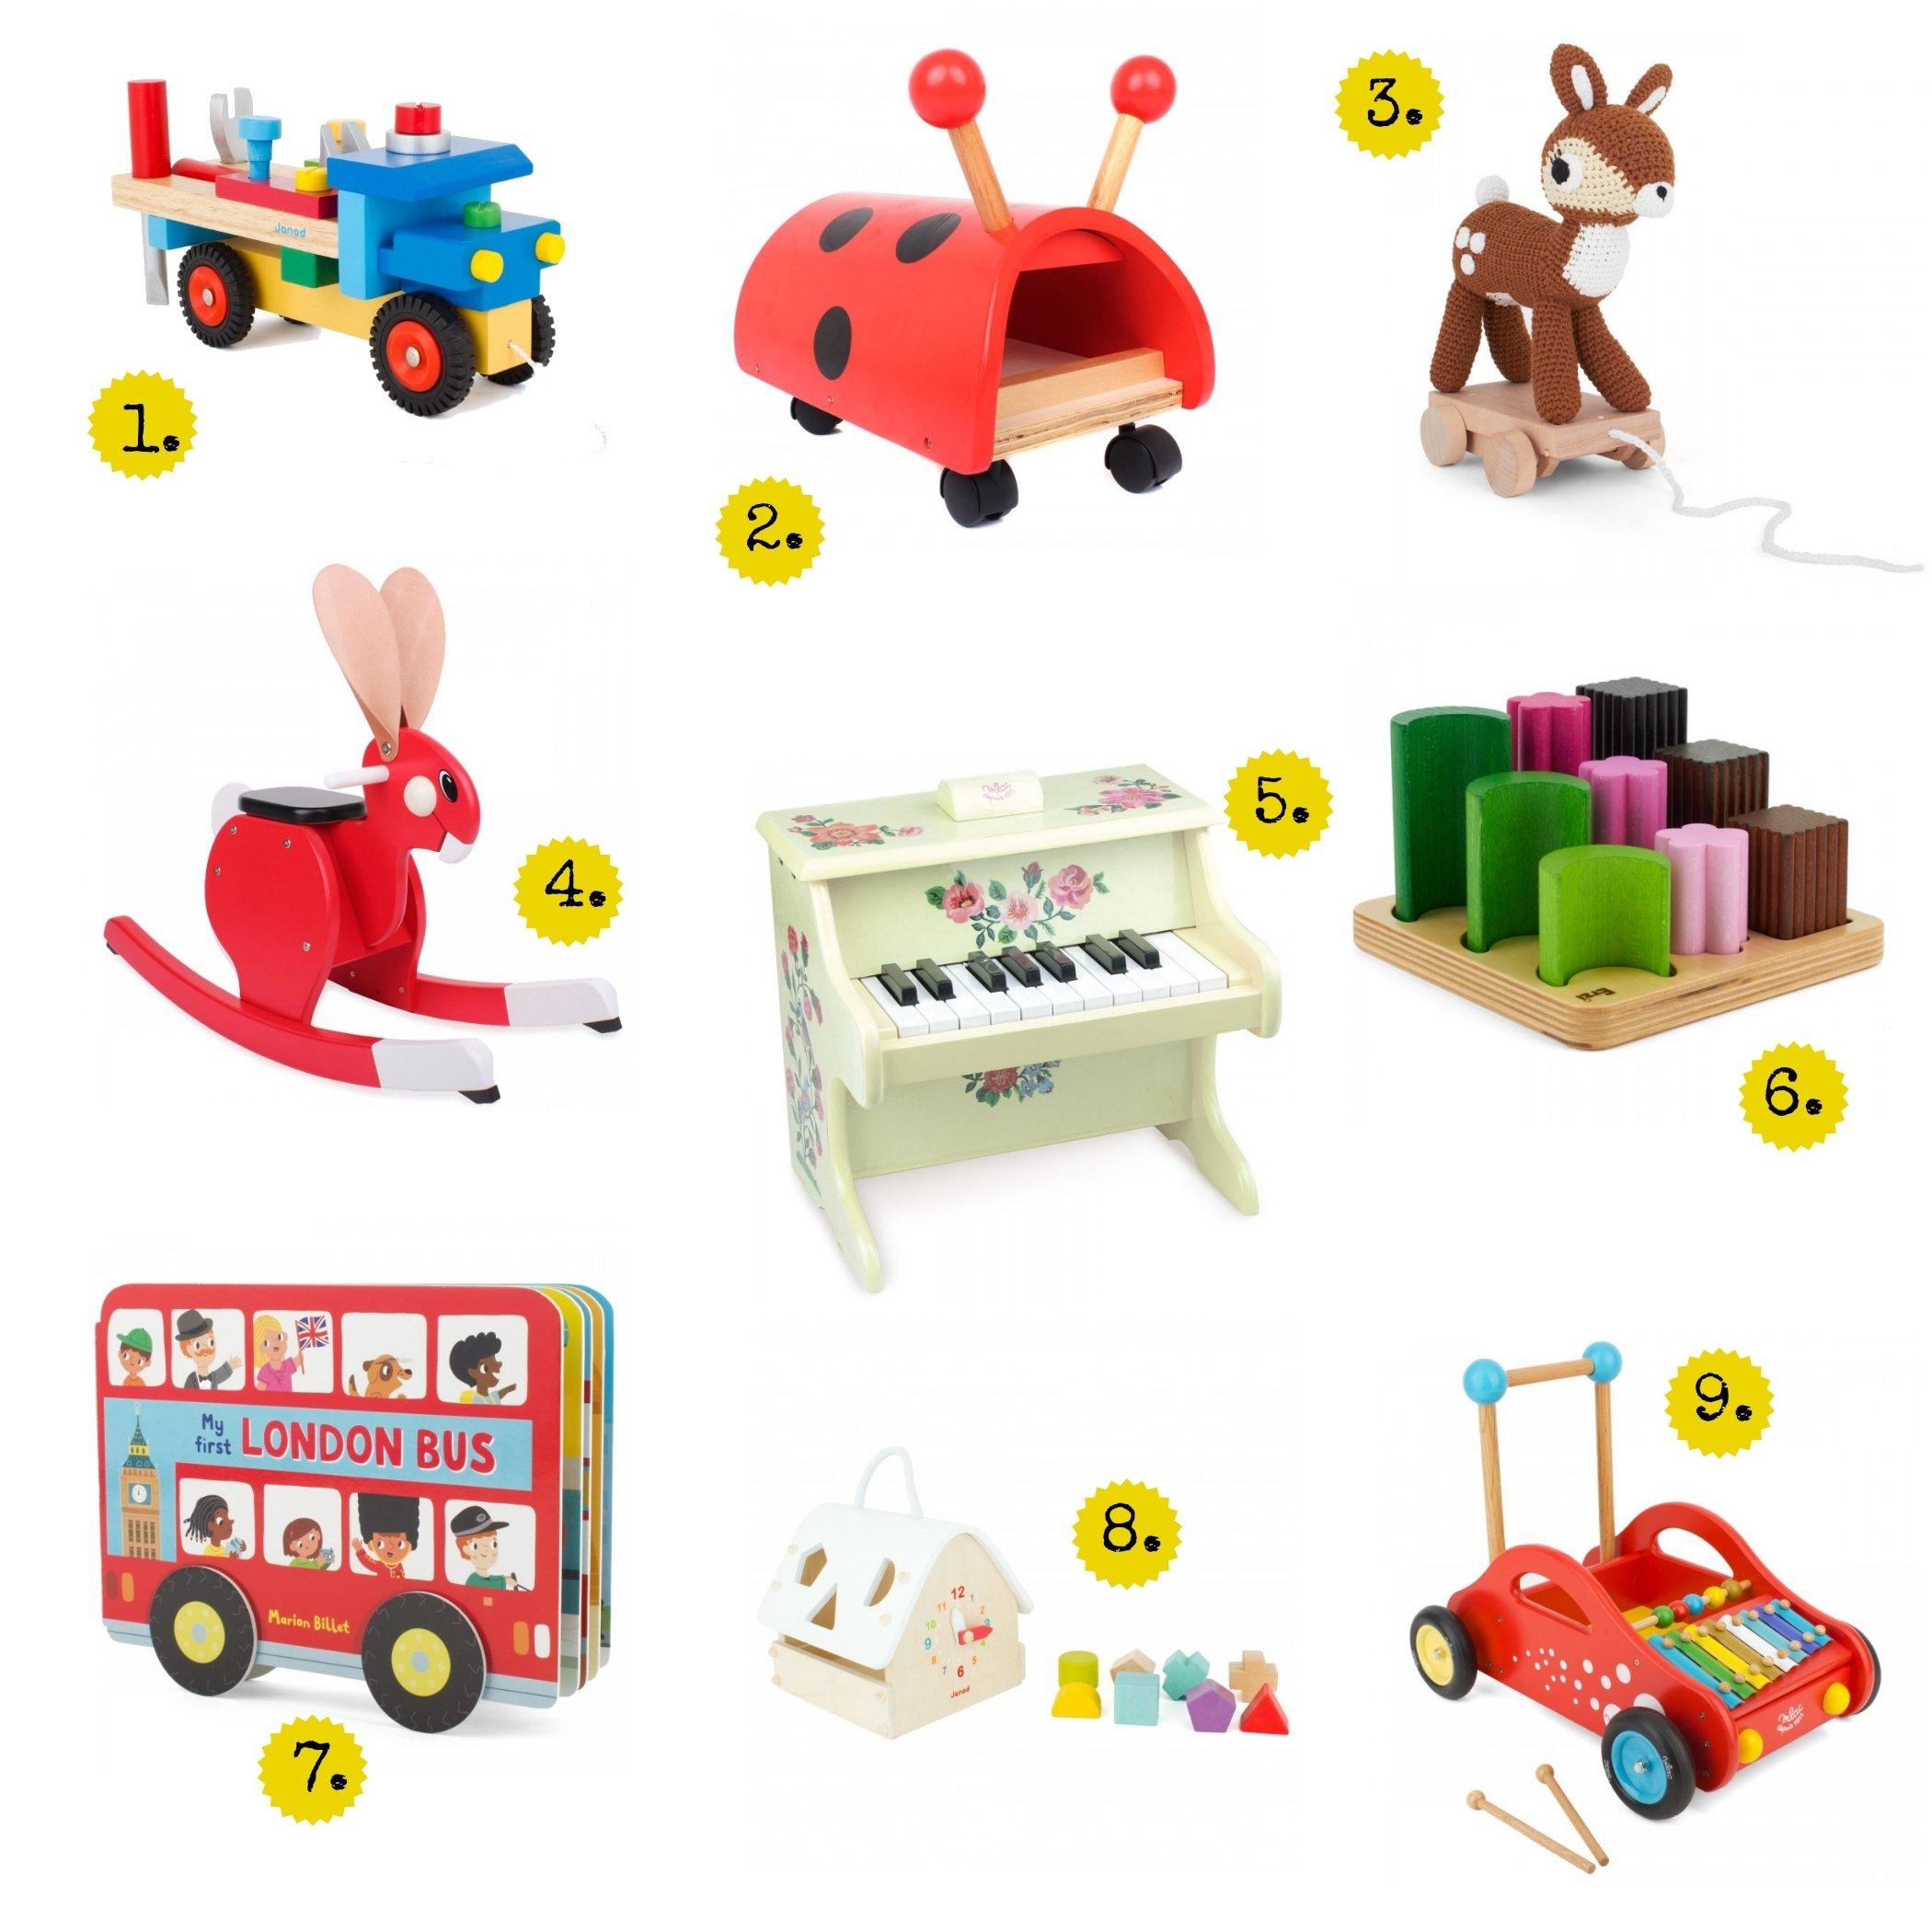 10 Wonderful Baby 1St Birthday Gift Ideas 9 great first birthday gifts birthday gifts birthdays and gift 3 2020